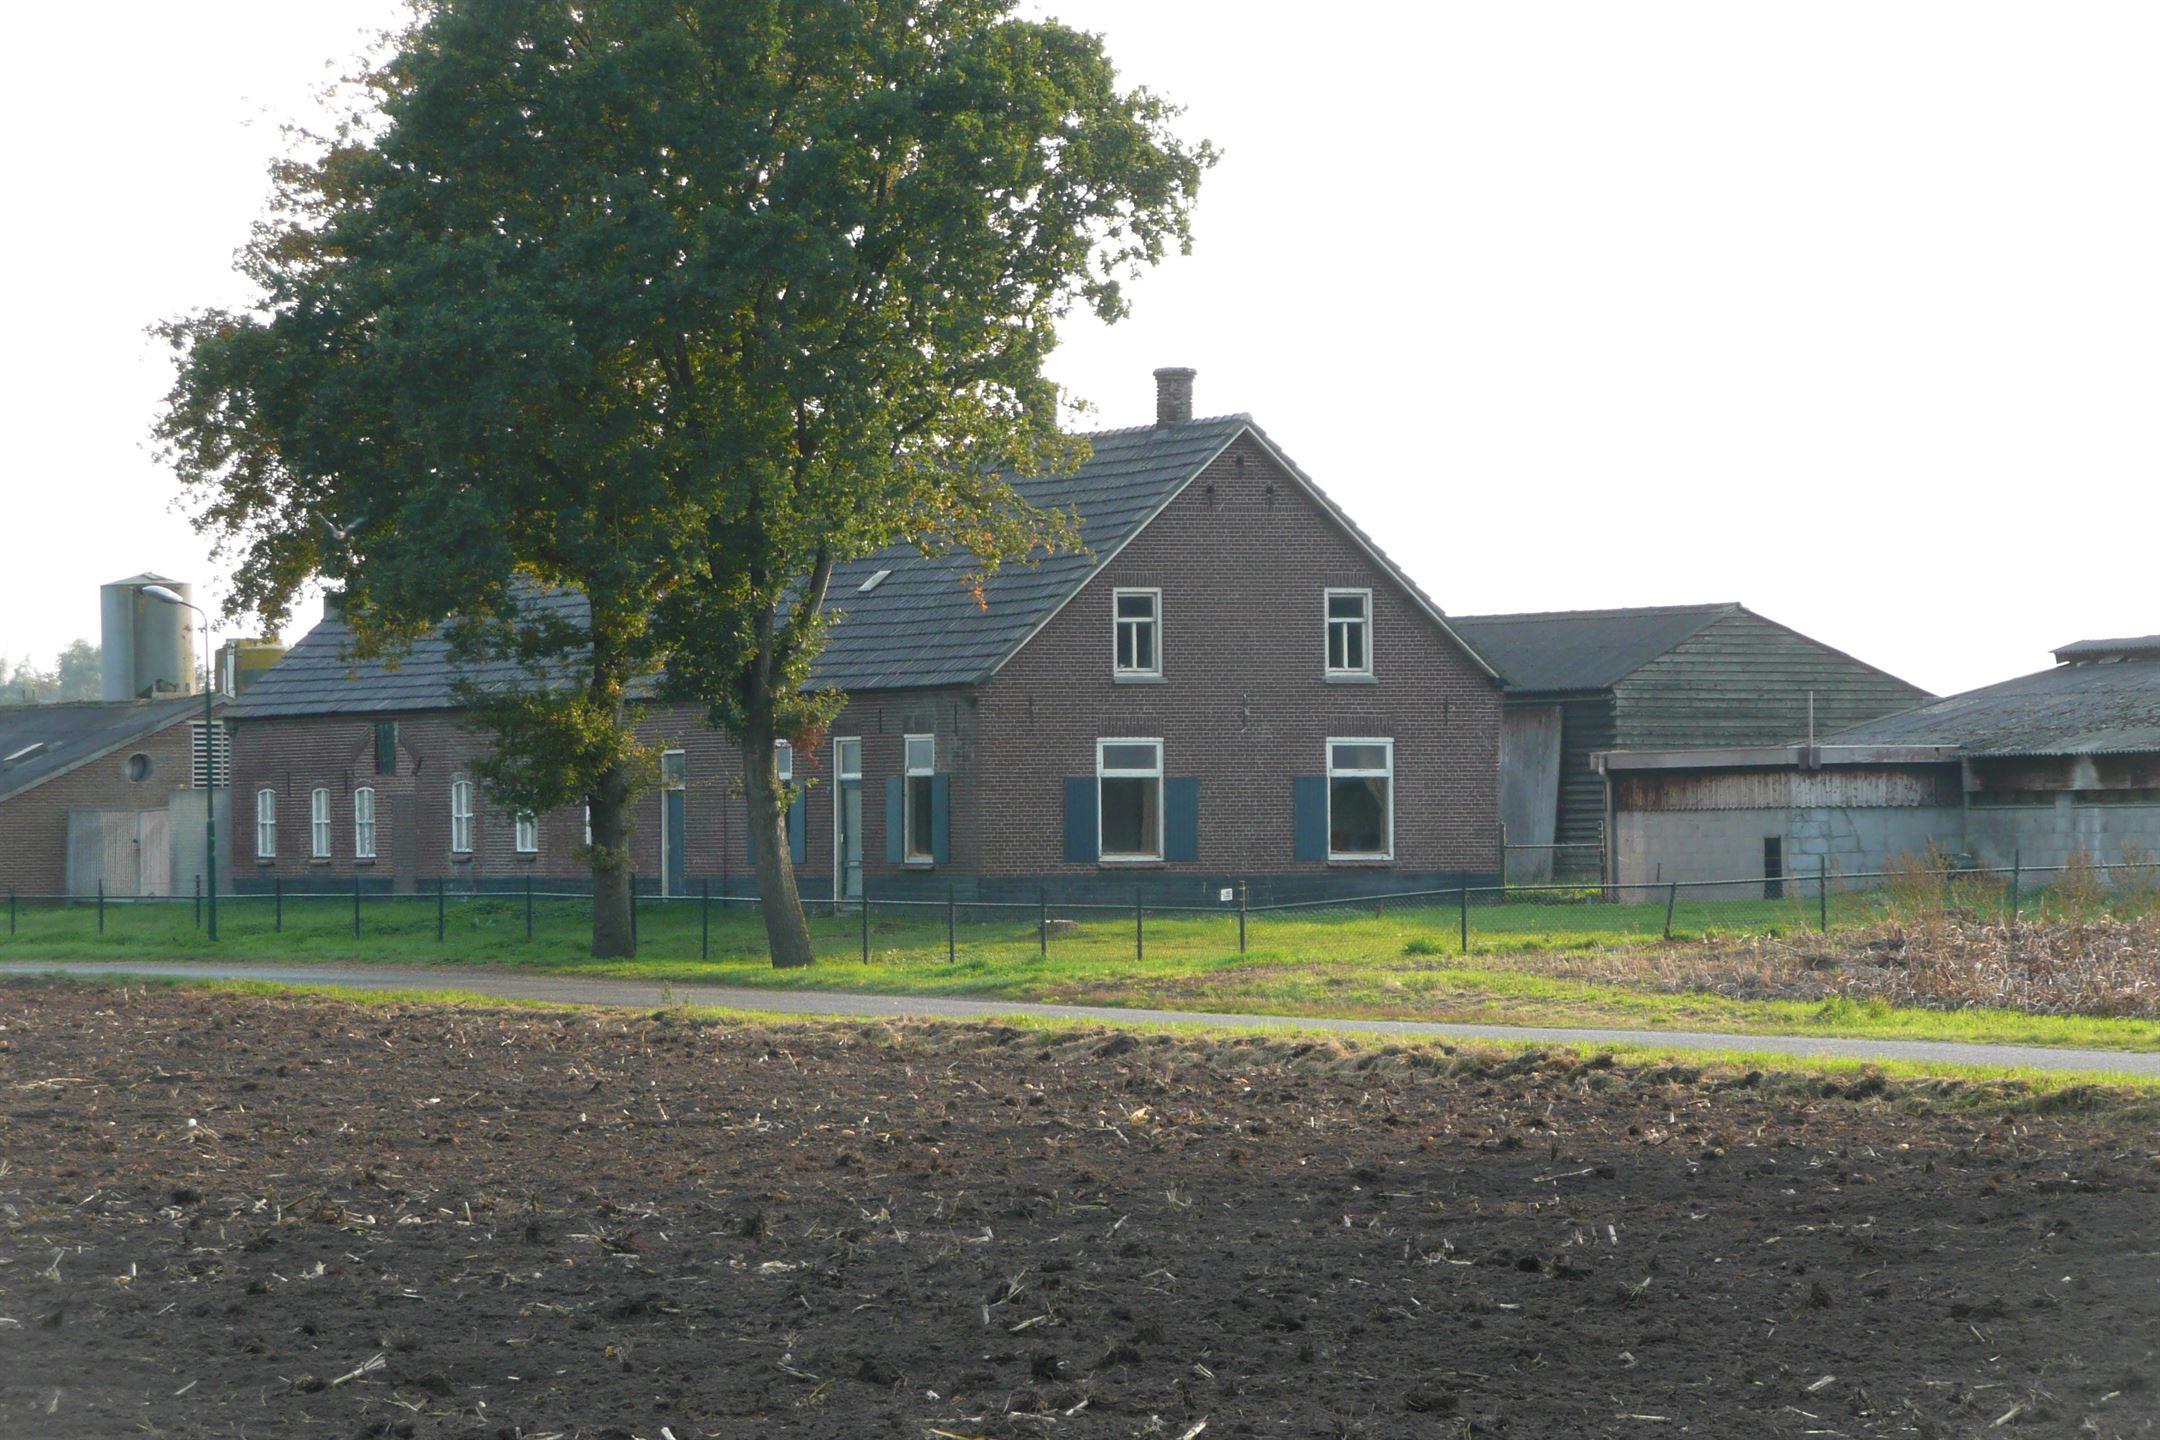 Huis te koop blauwstraat 1 a 5845 ek sint anthonis funda for Mijn funda